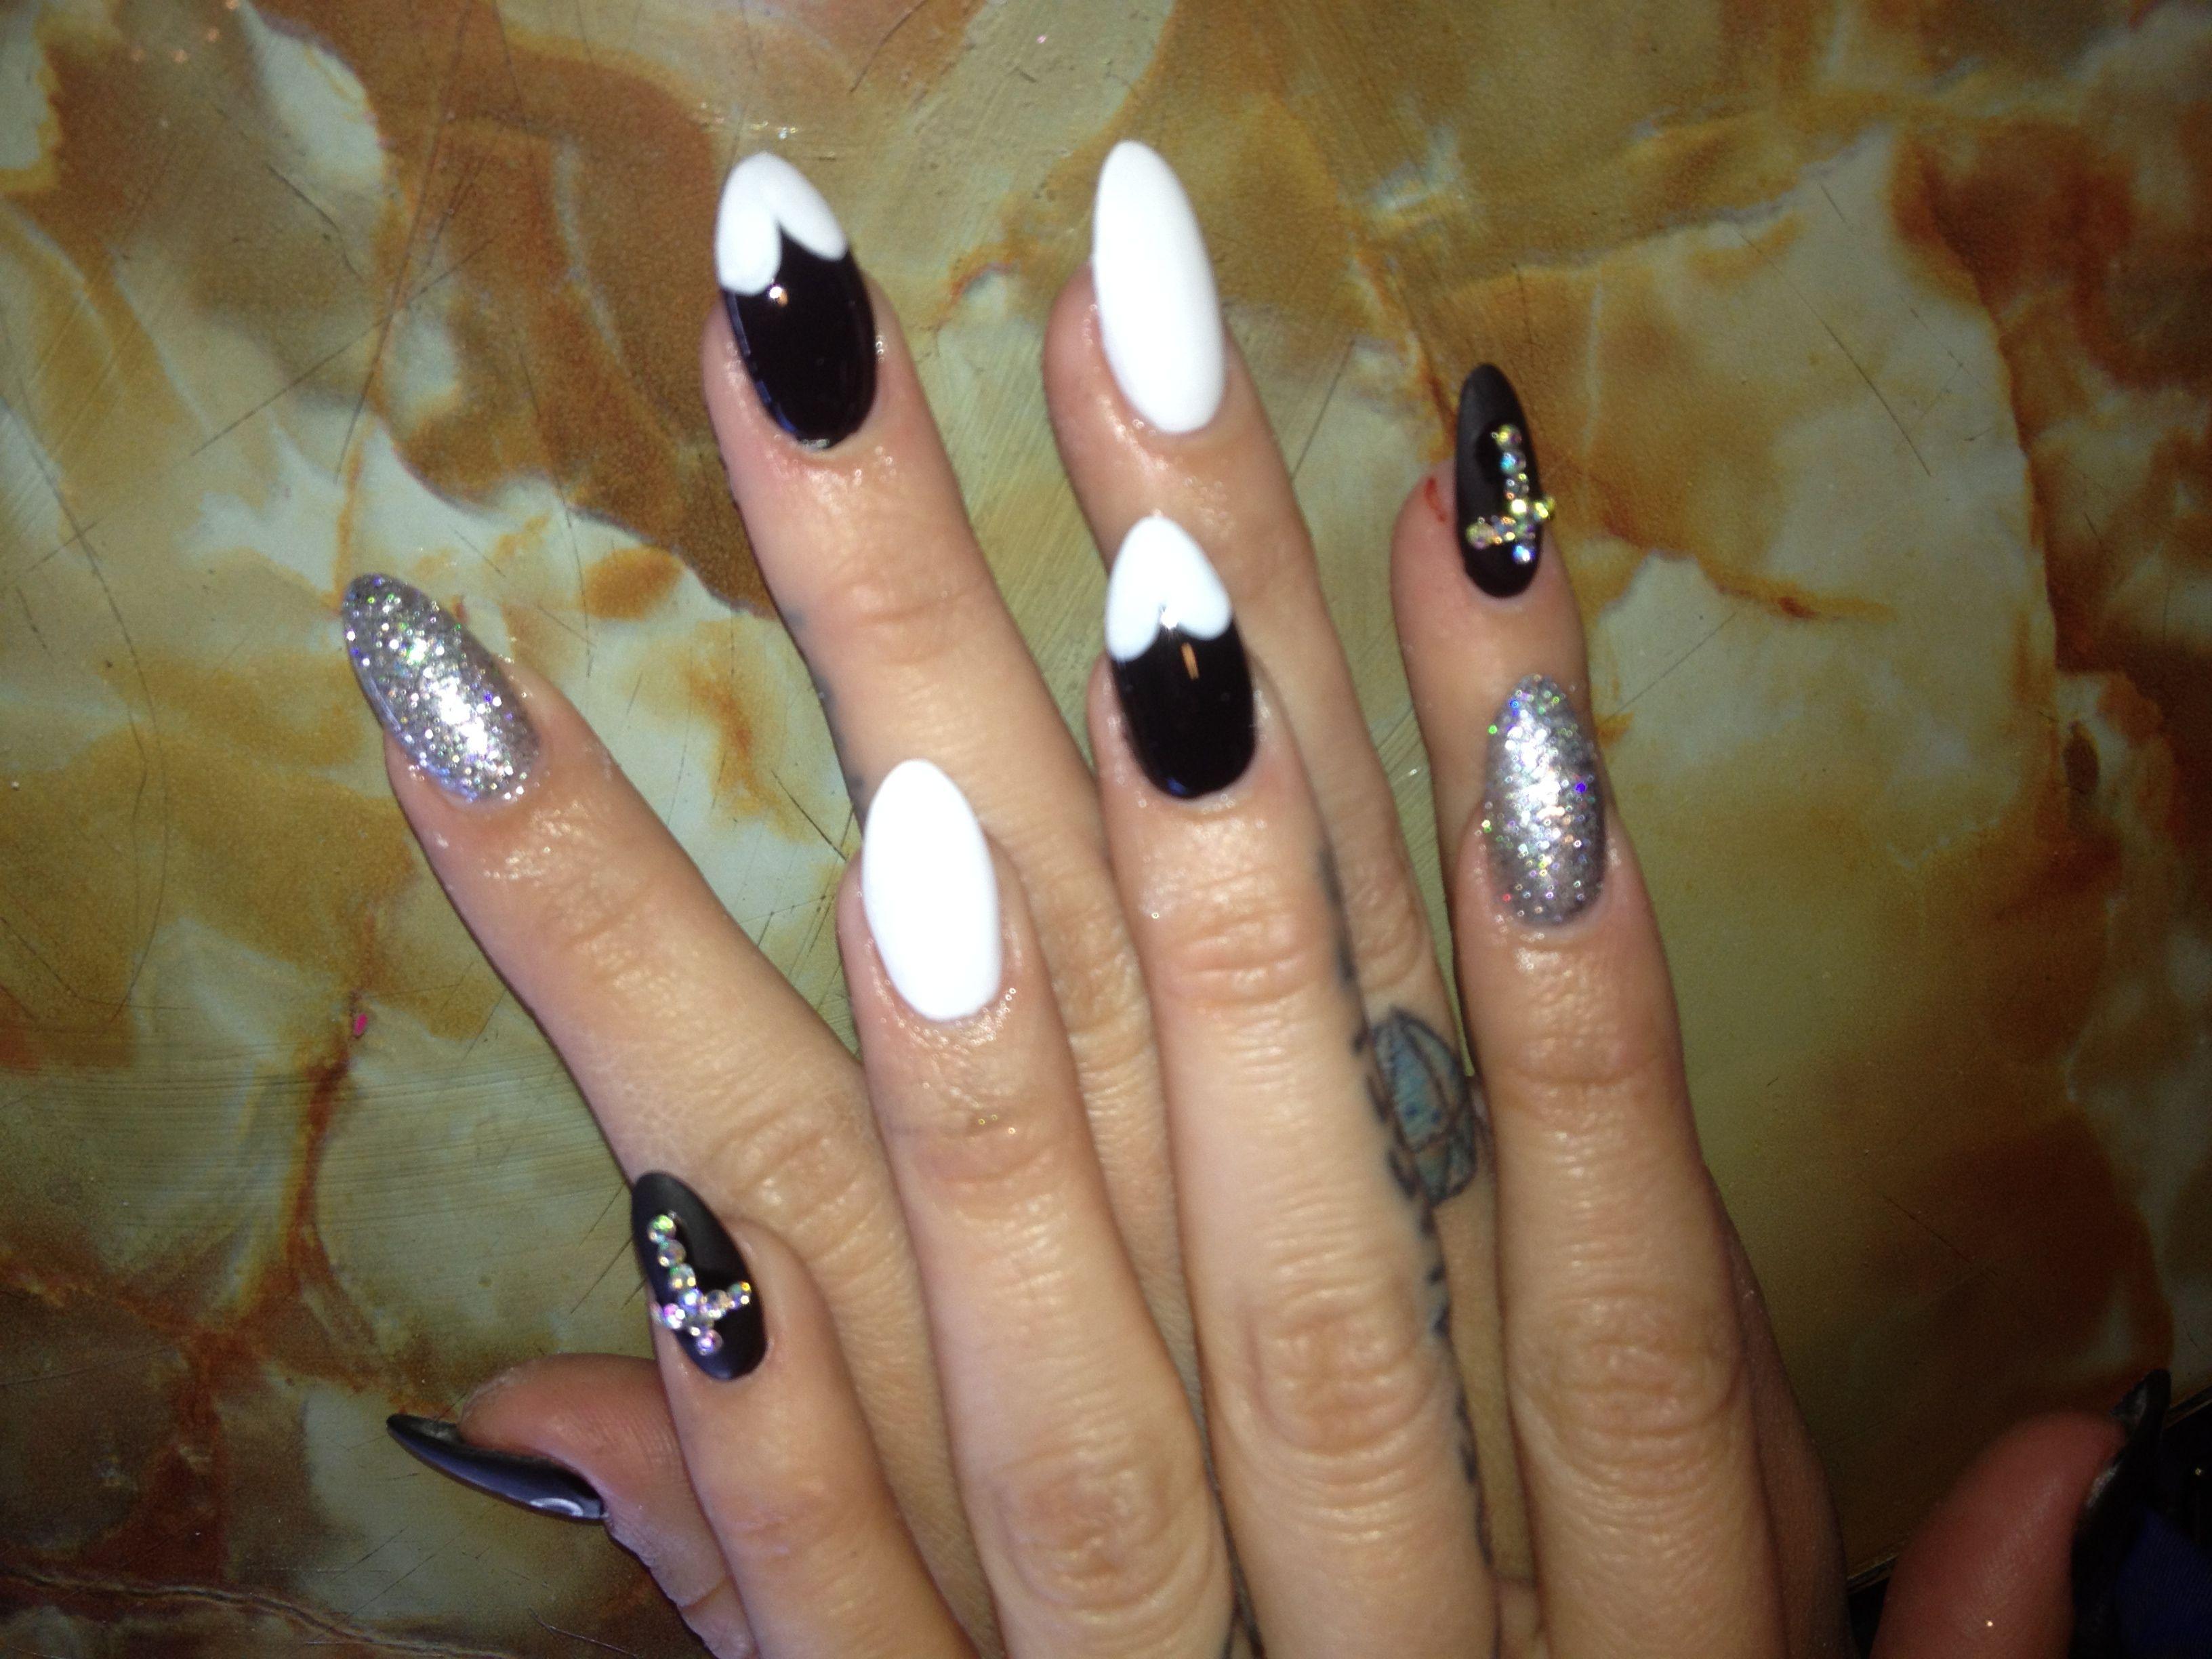 Pointy nail art   Nail art by Tien Pham   Pinterest   Pointy nails ...